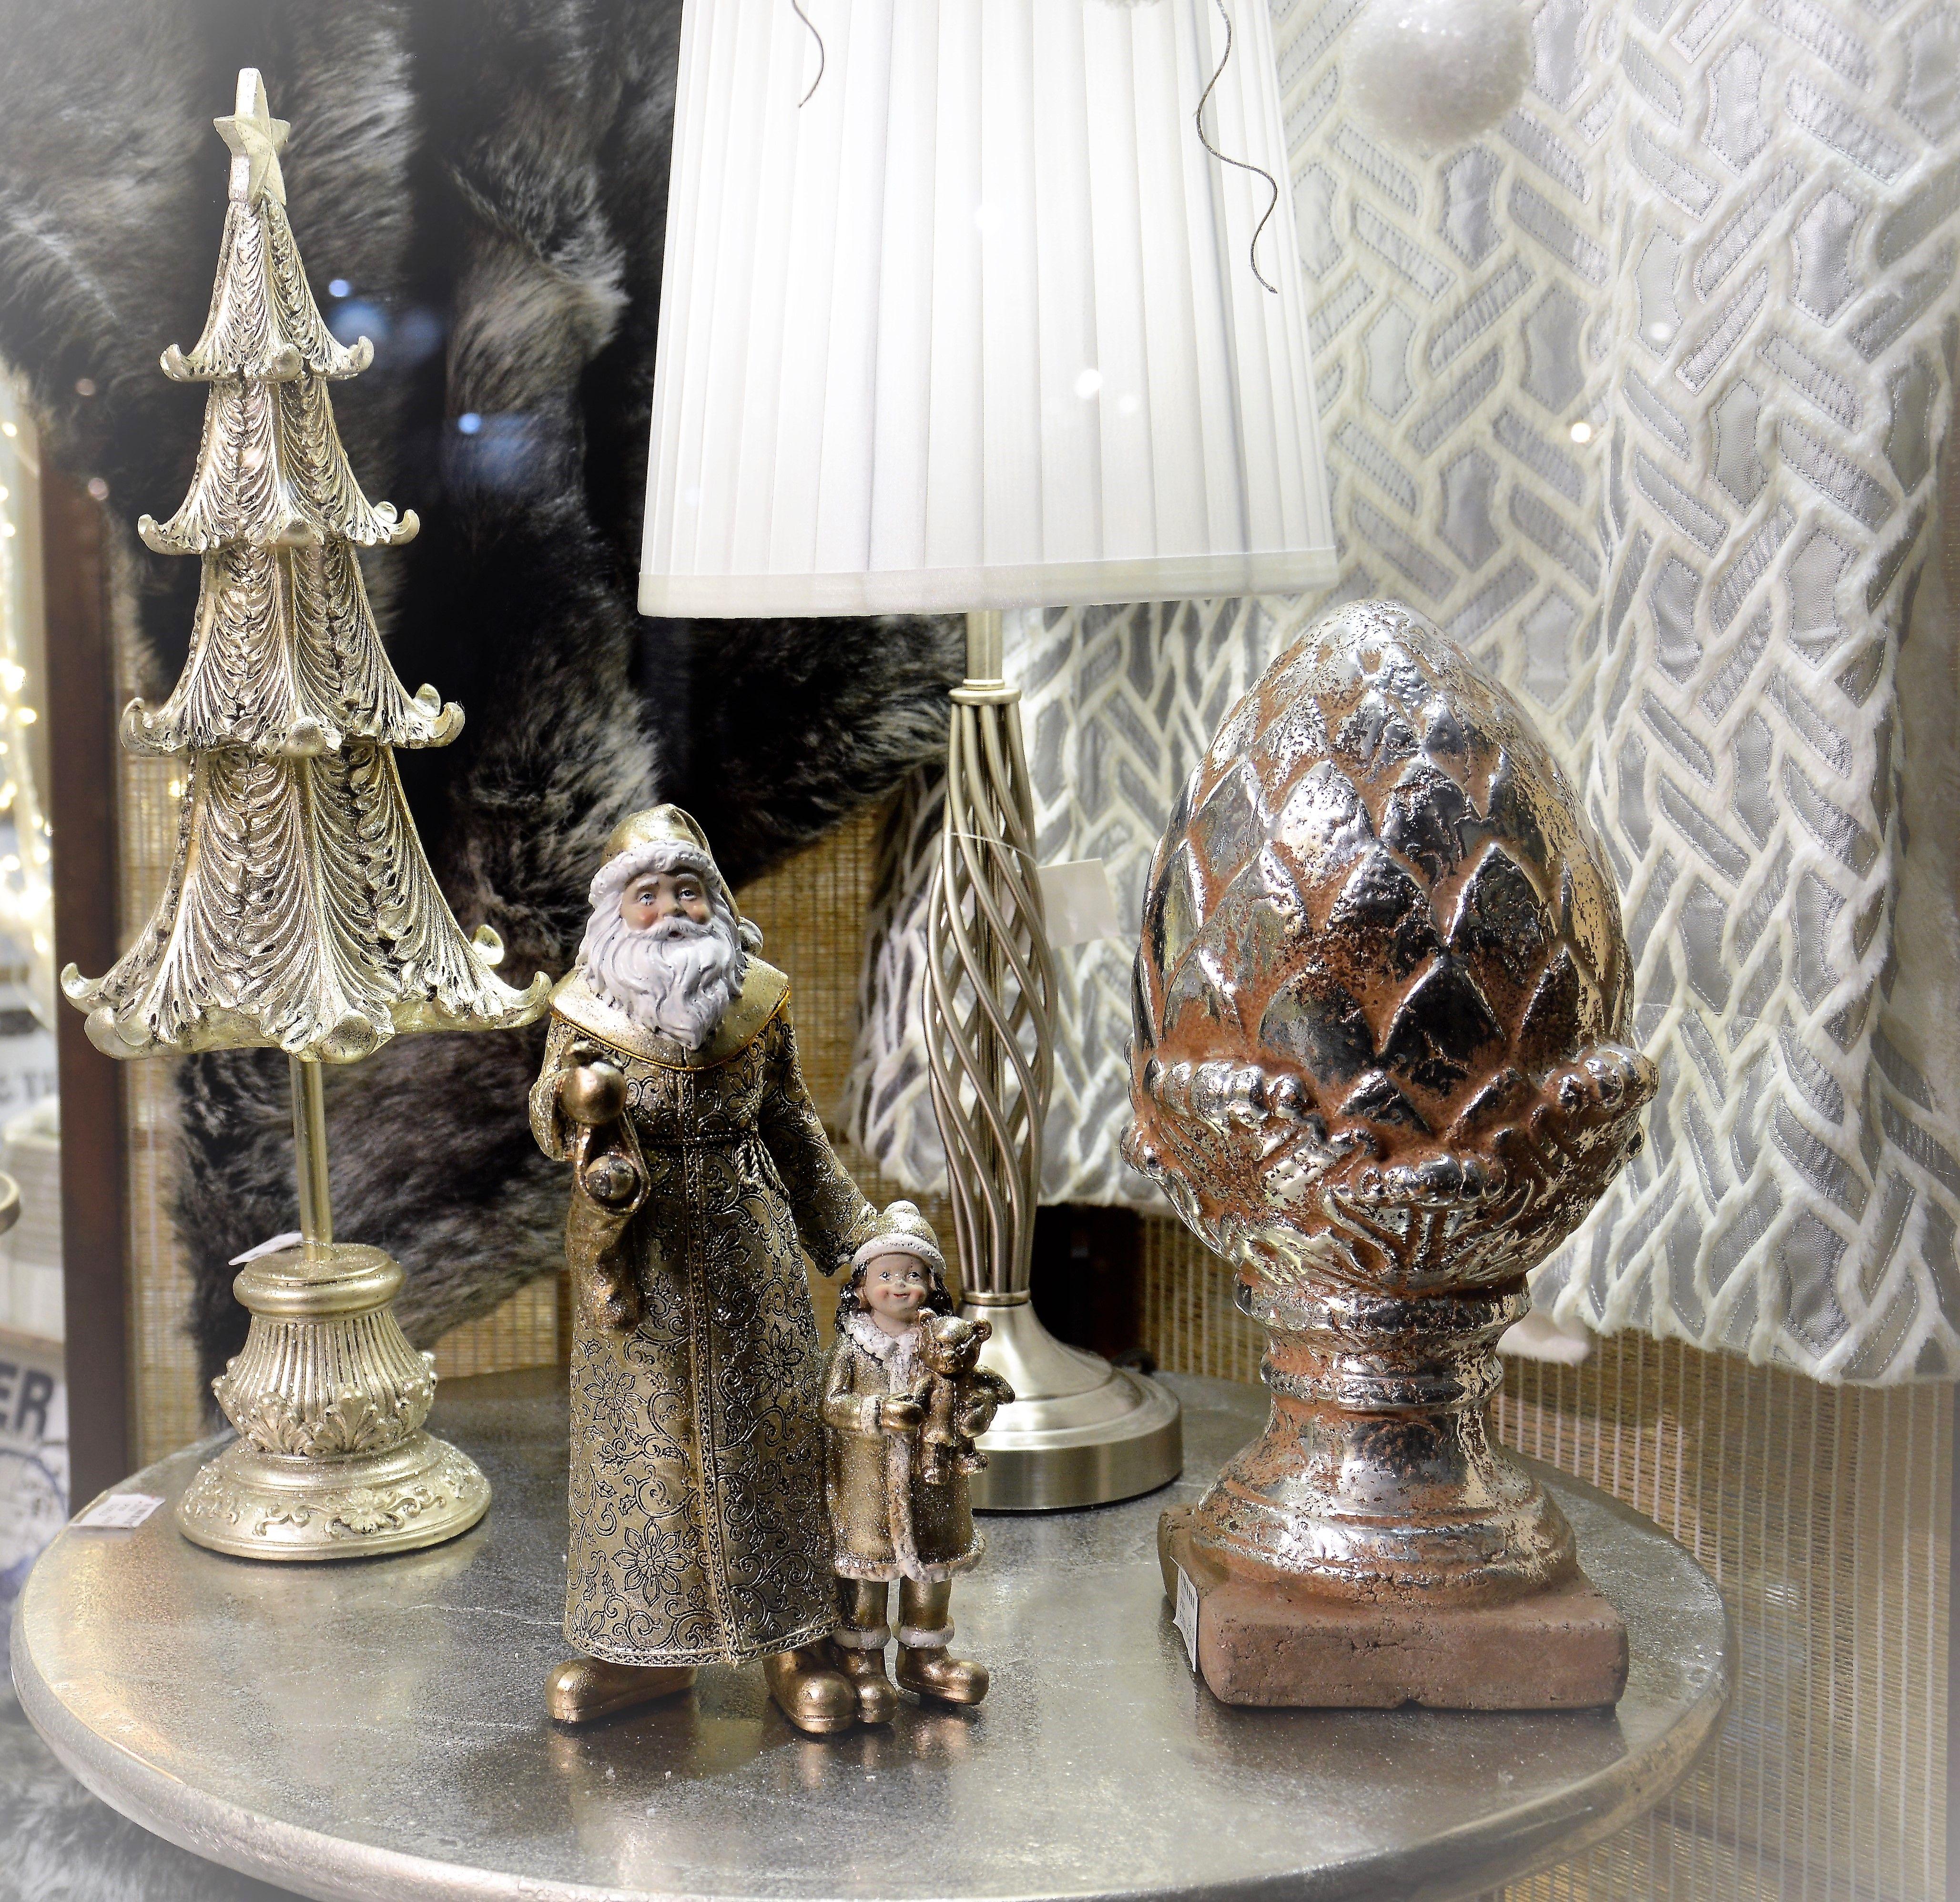 Navidad, pequeños detalles llenos de sensaciones.Christmas, small details full of sensations.